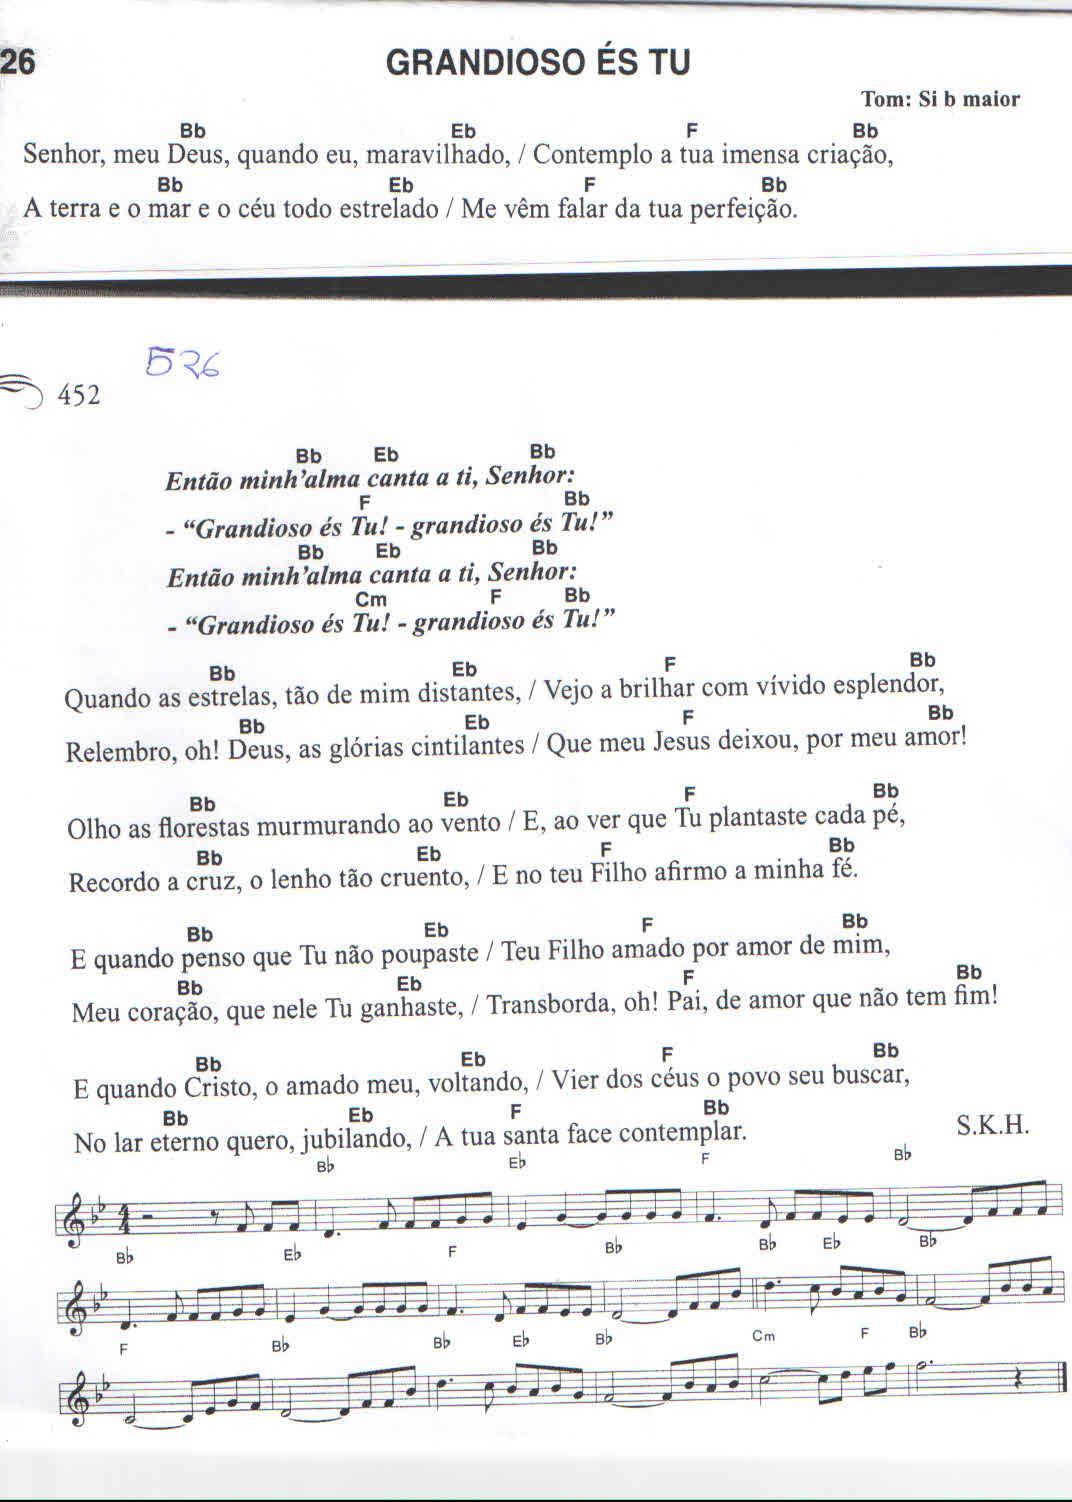 Partiuras: Partitura violino e teclado- Harpa Cristã - Grandioso és Tú - 526